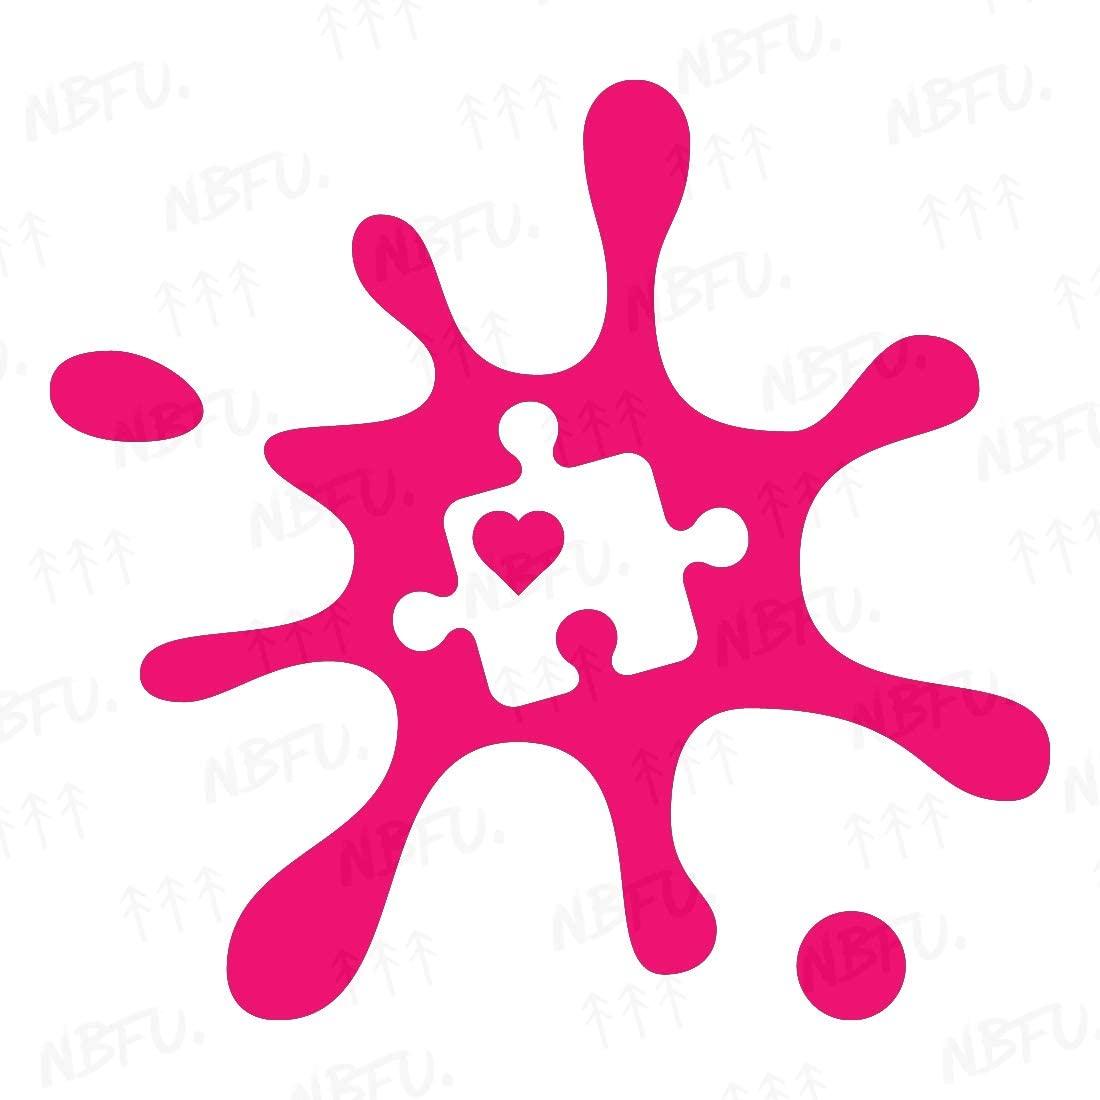 NBFU Decals Autism Puzzle Piece Heart 1 (Pink) (Set of 2) Premium Waterproof Vinyl Decal Stickers for Laptop Phone Accessory Helmet Car Window Bumper Mug Tuber Cup Door Wall Decoration